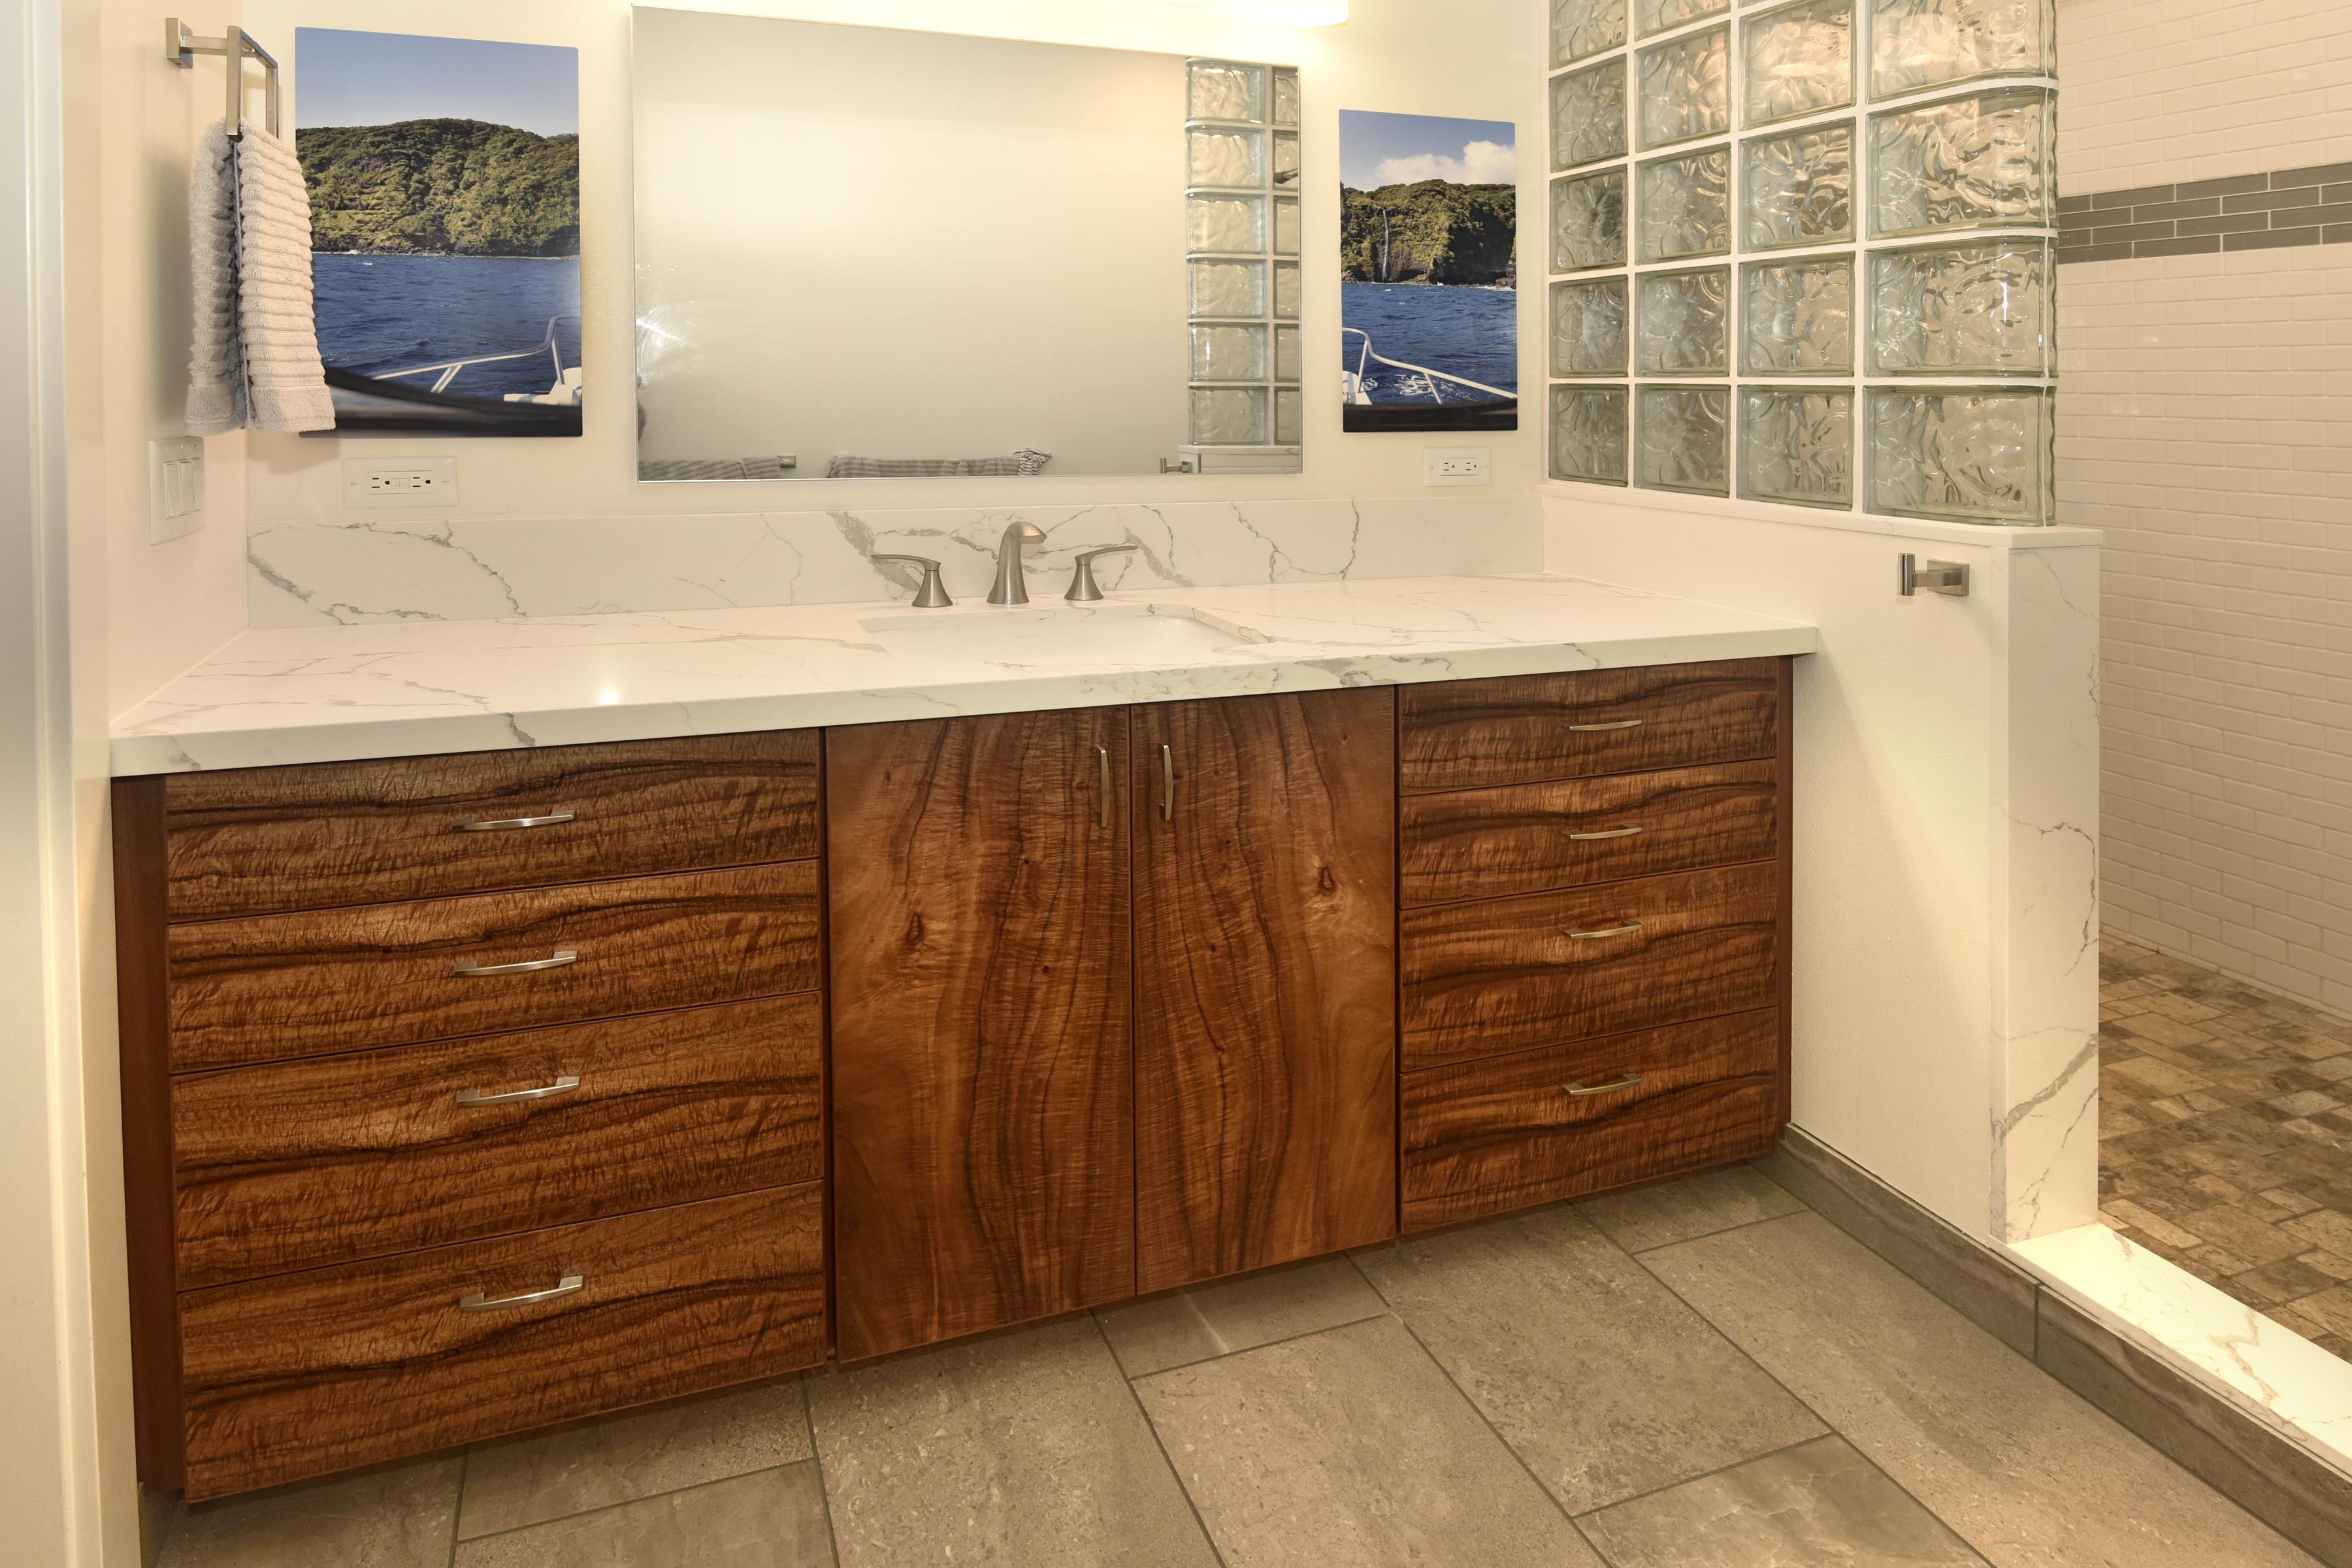 Koa Bathroom Vanity Wooden Touches